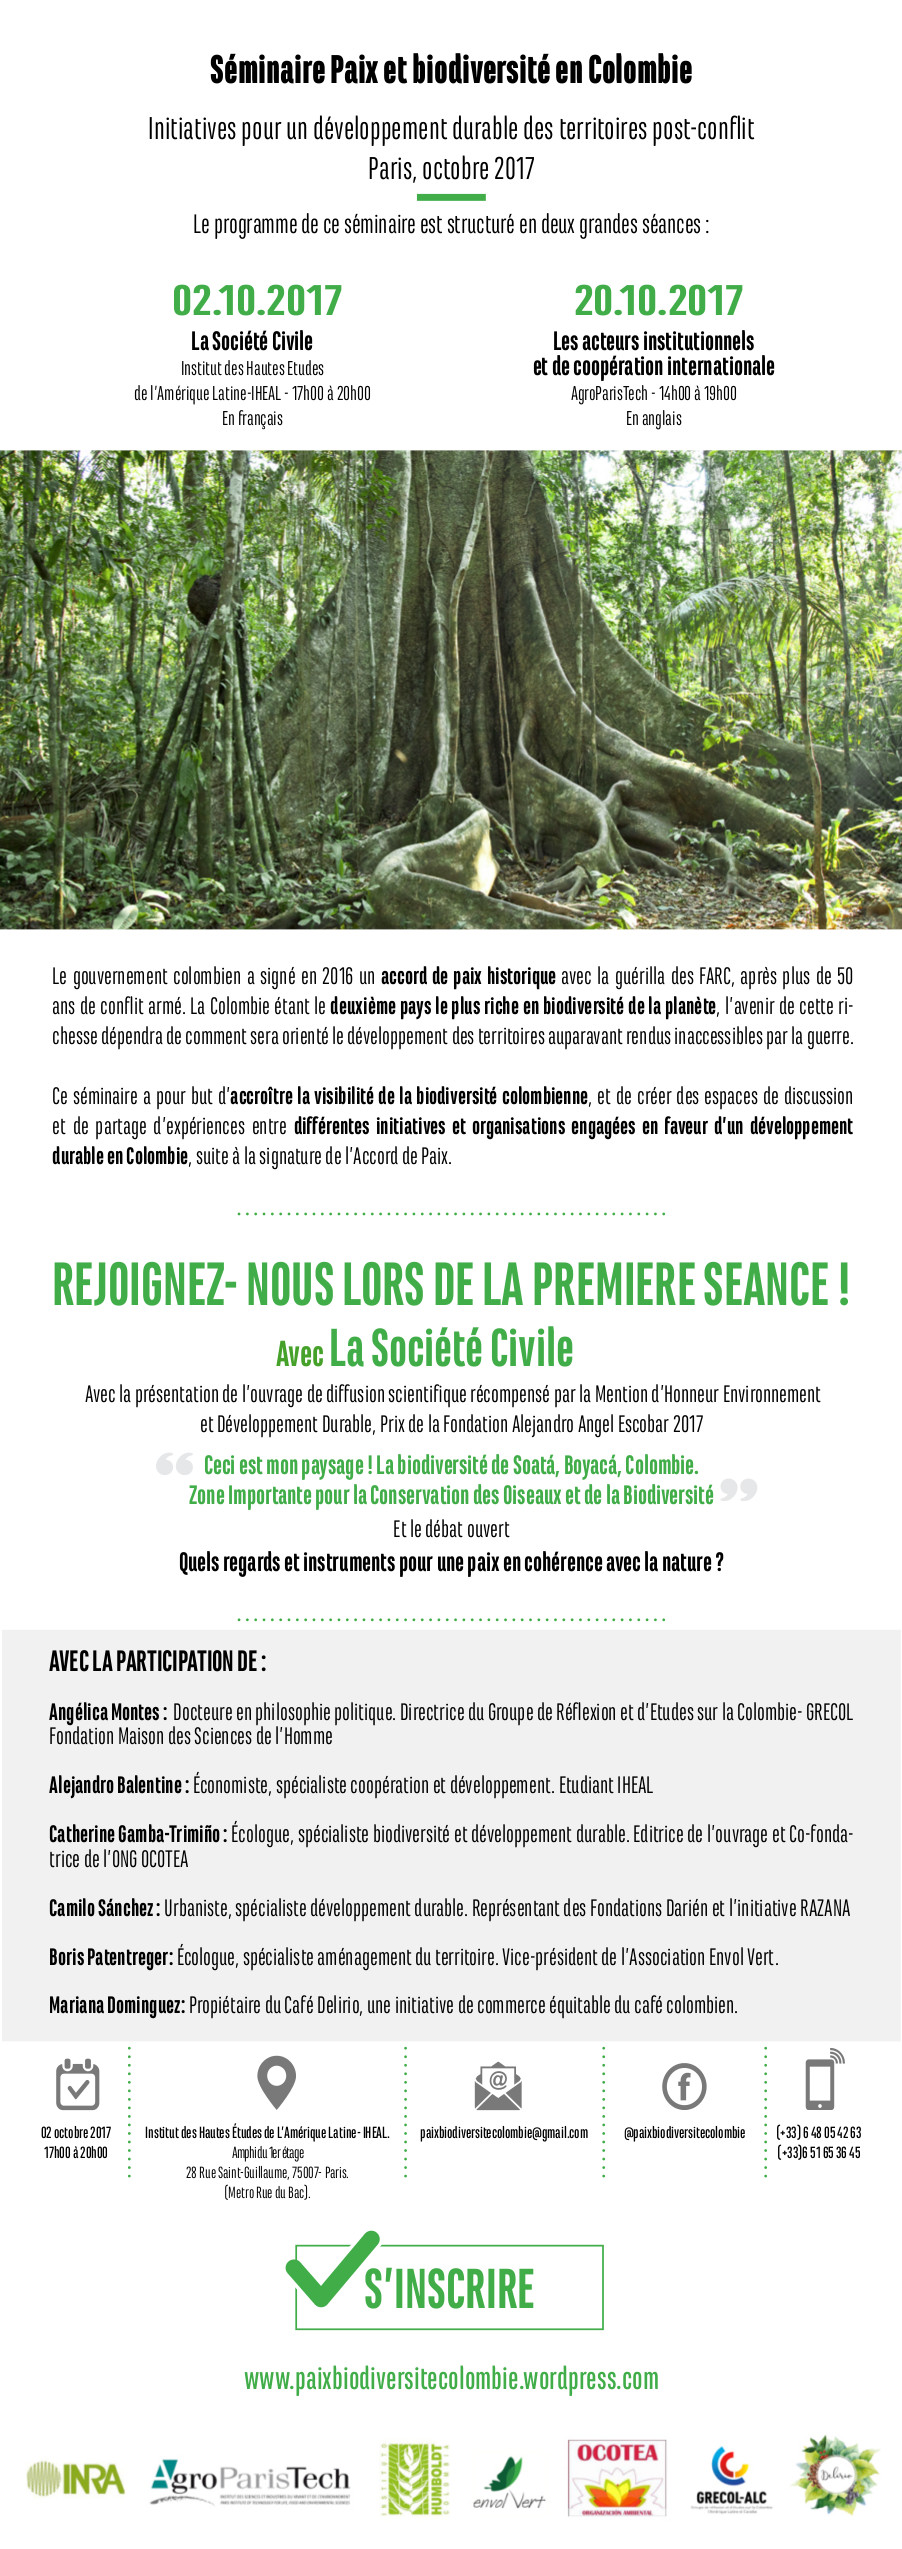 Invitation Paix et Biodiversité